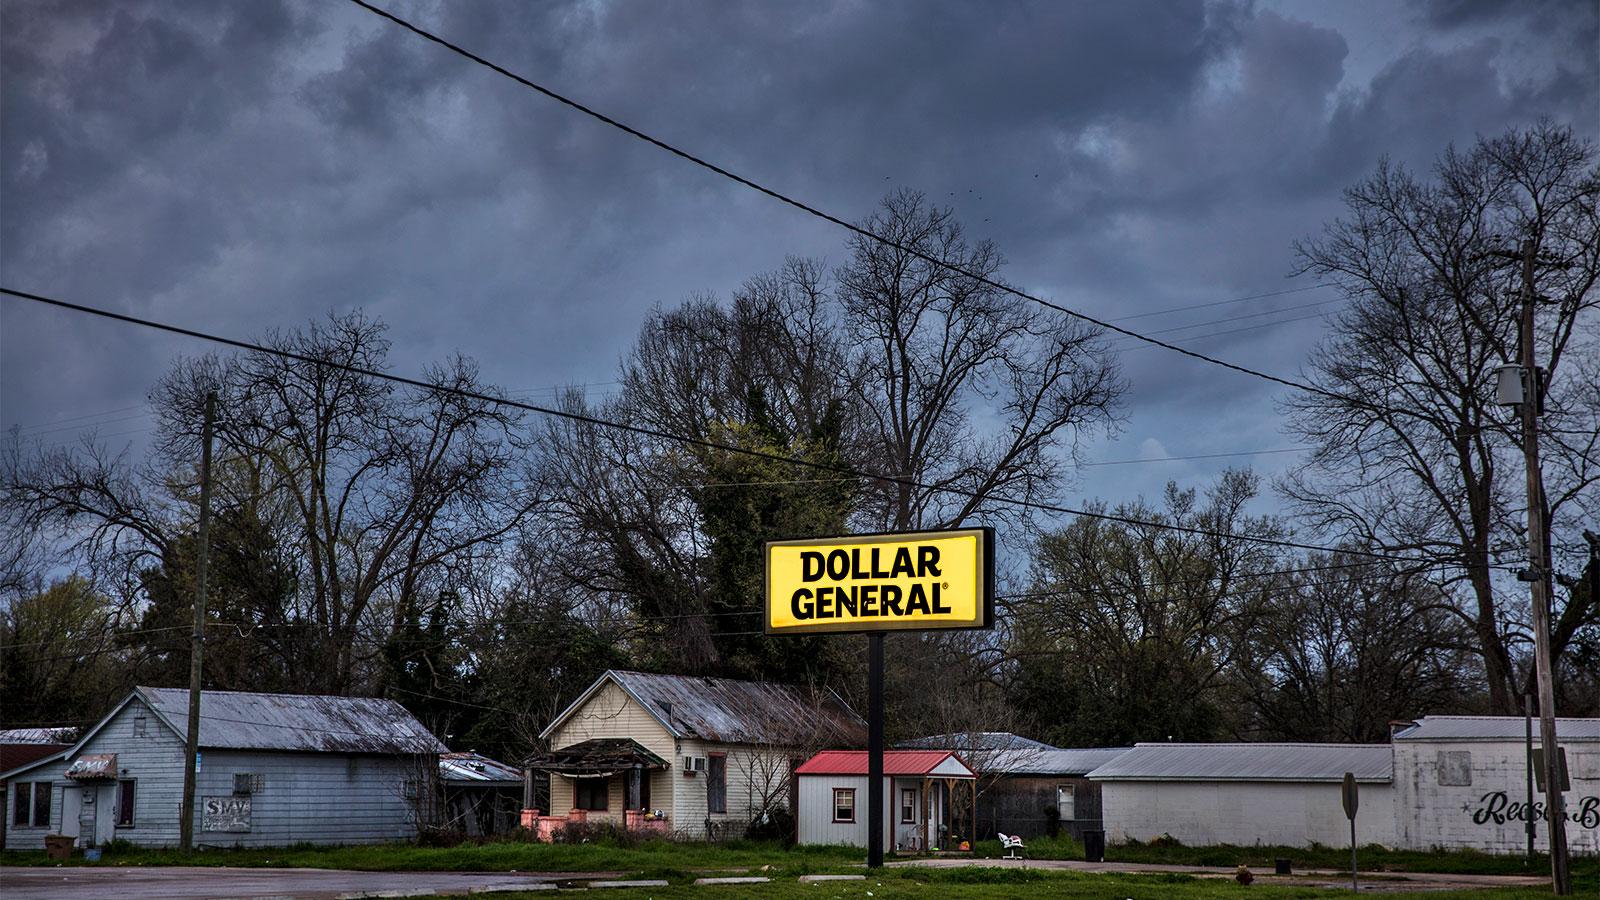 A Dollar General sign in Selma, Alabama